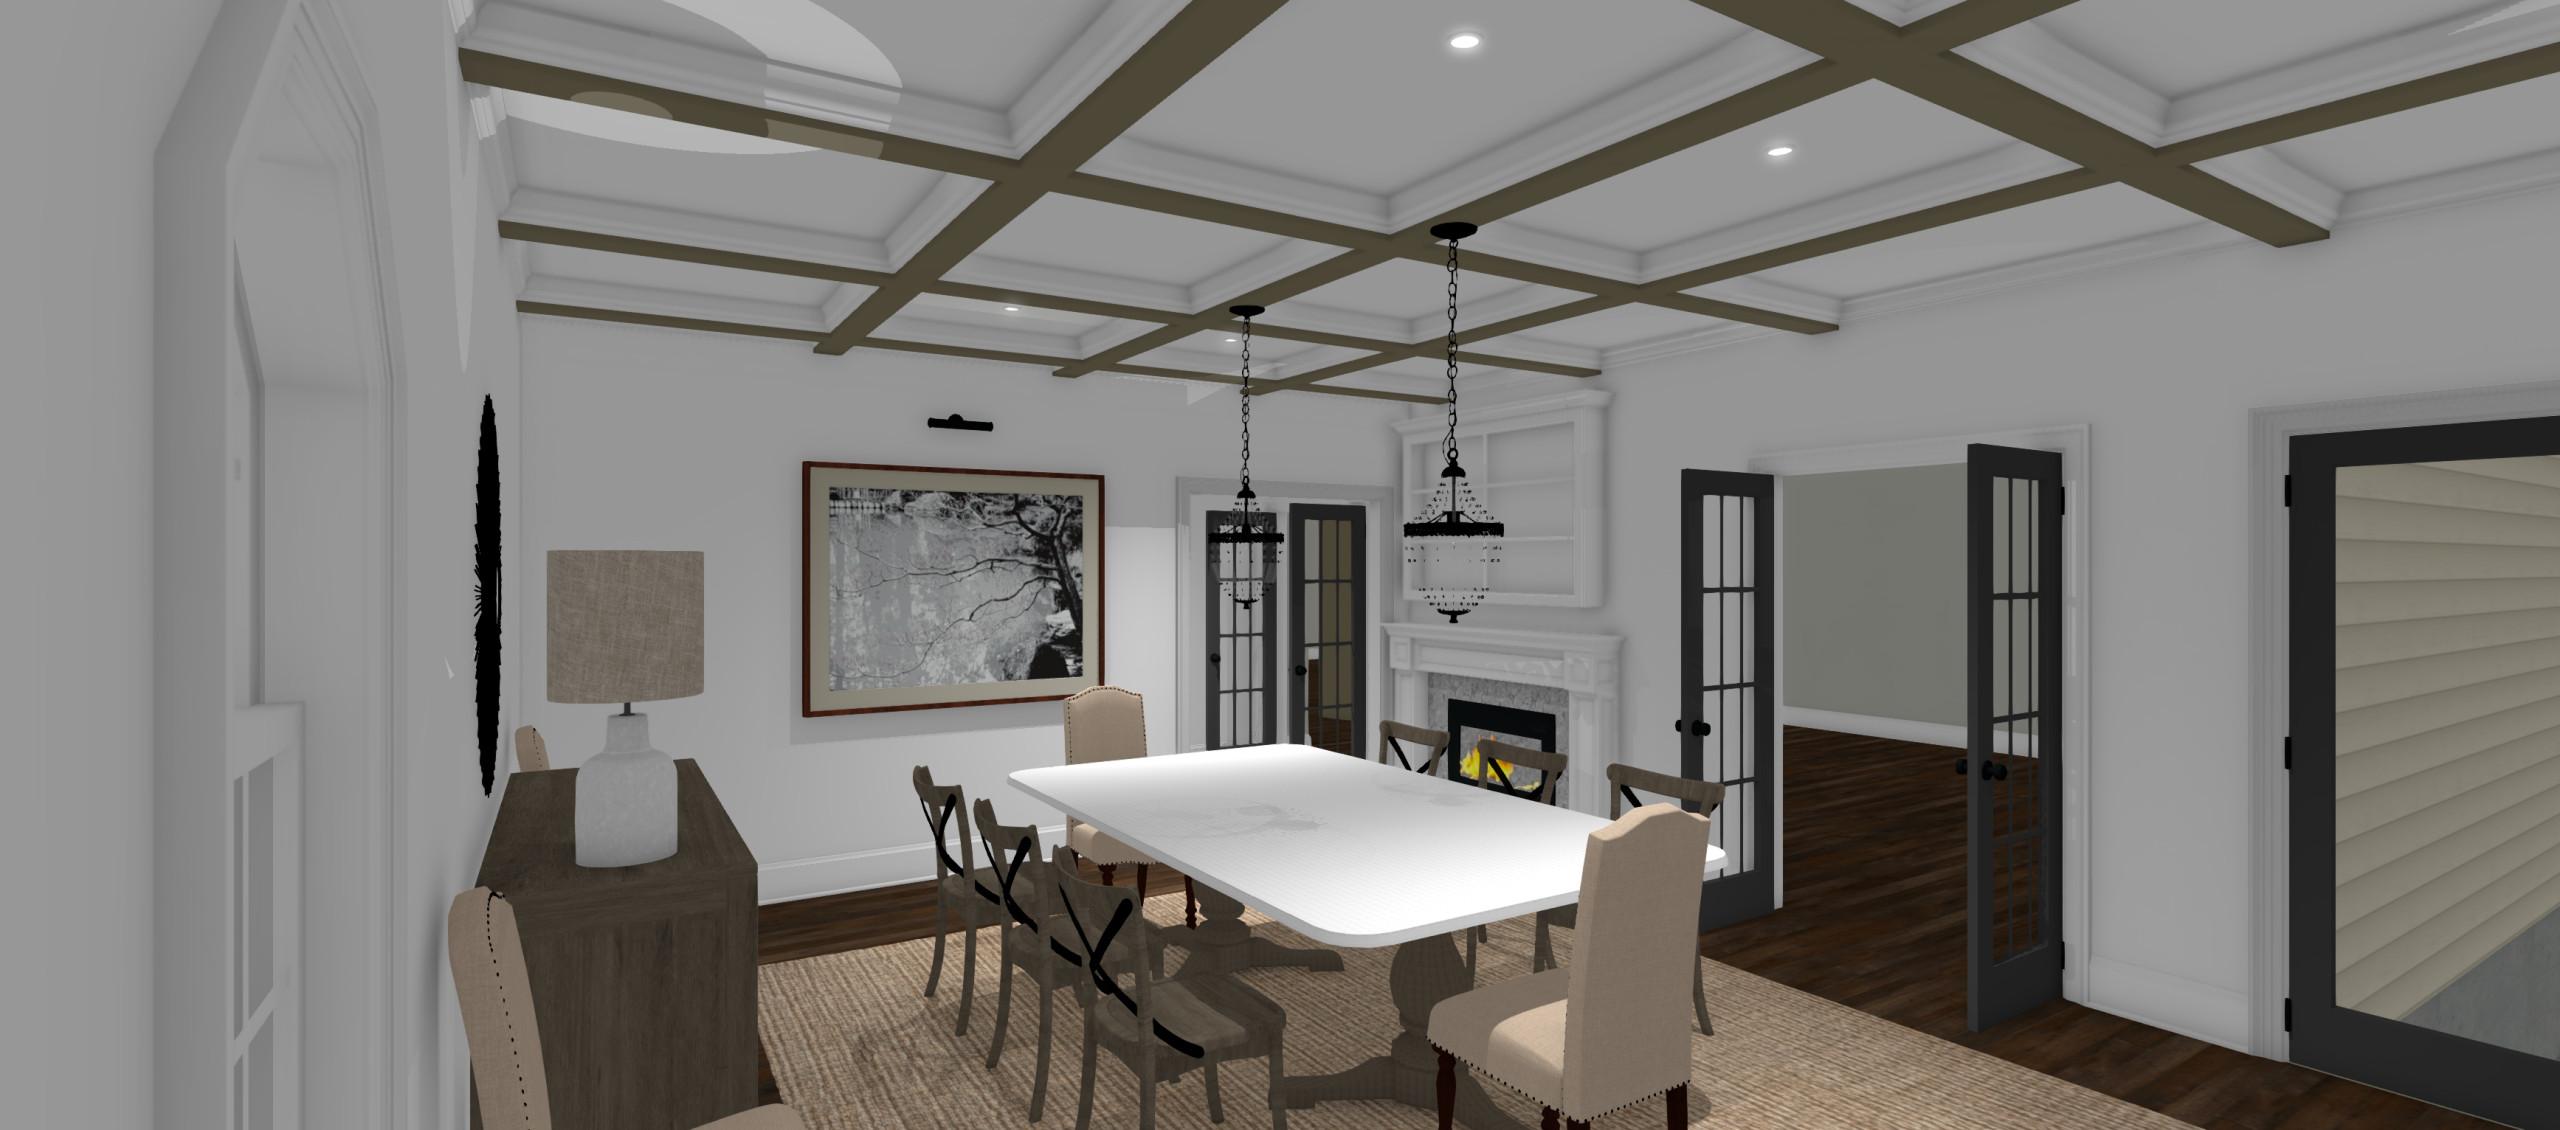 Conceptual Dining Room Design